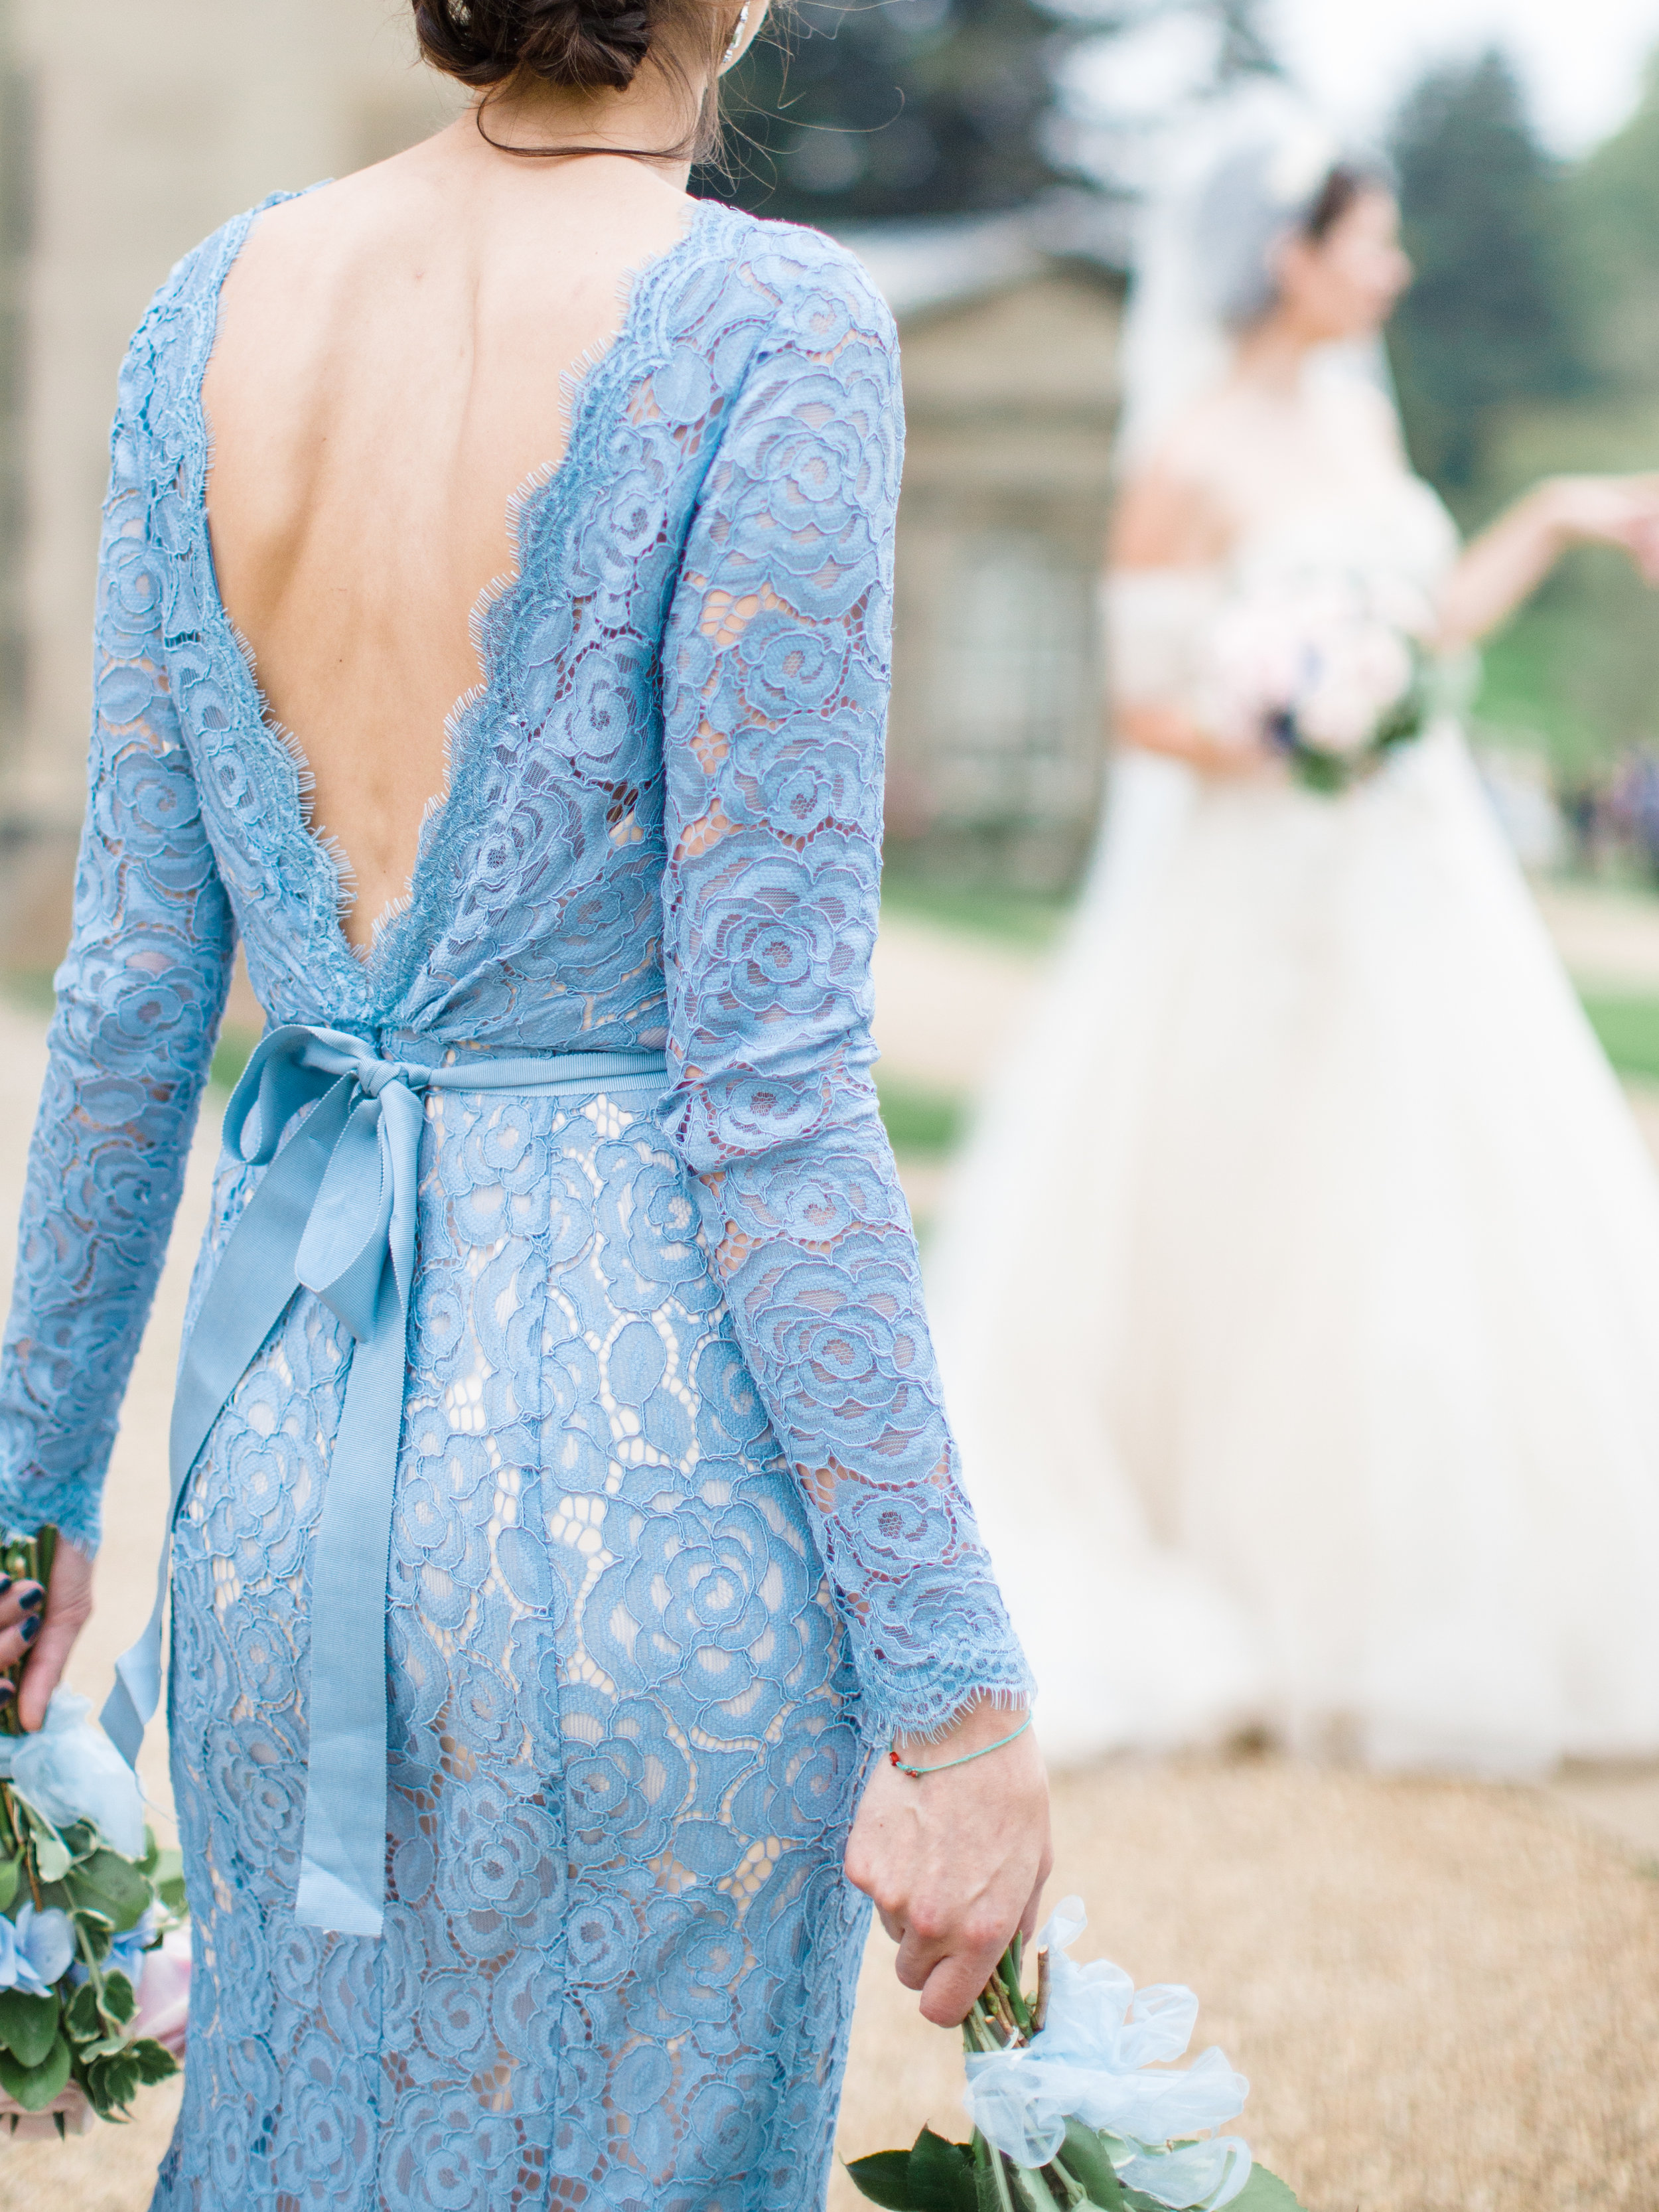 Alara gown at Co-Founder Louie's wedding. Photo -  Amy O'Boyle